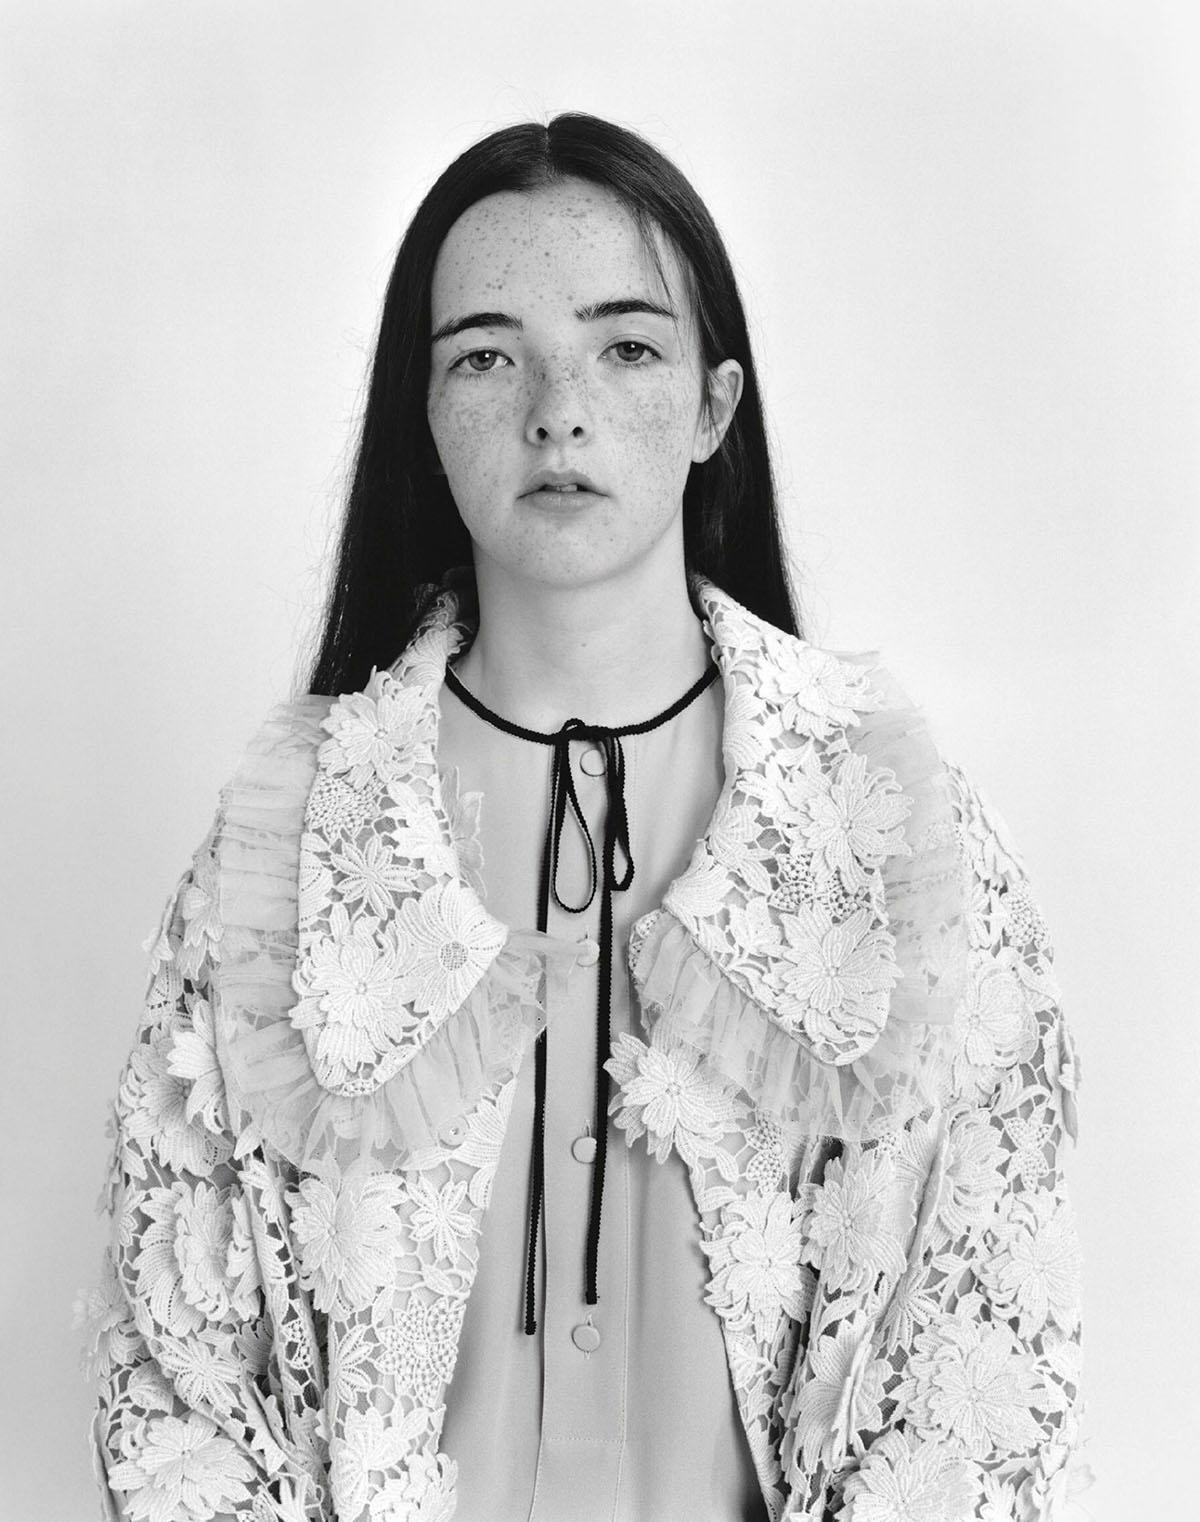 ''Teen Spirit'' by Julie Greve for Vogue Italia July 2021